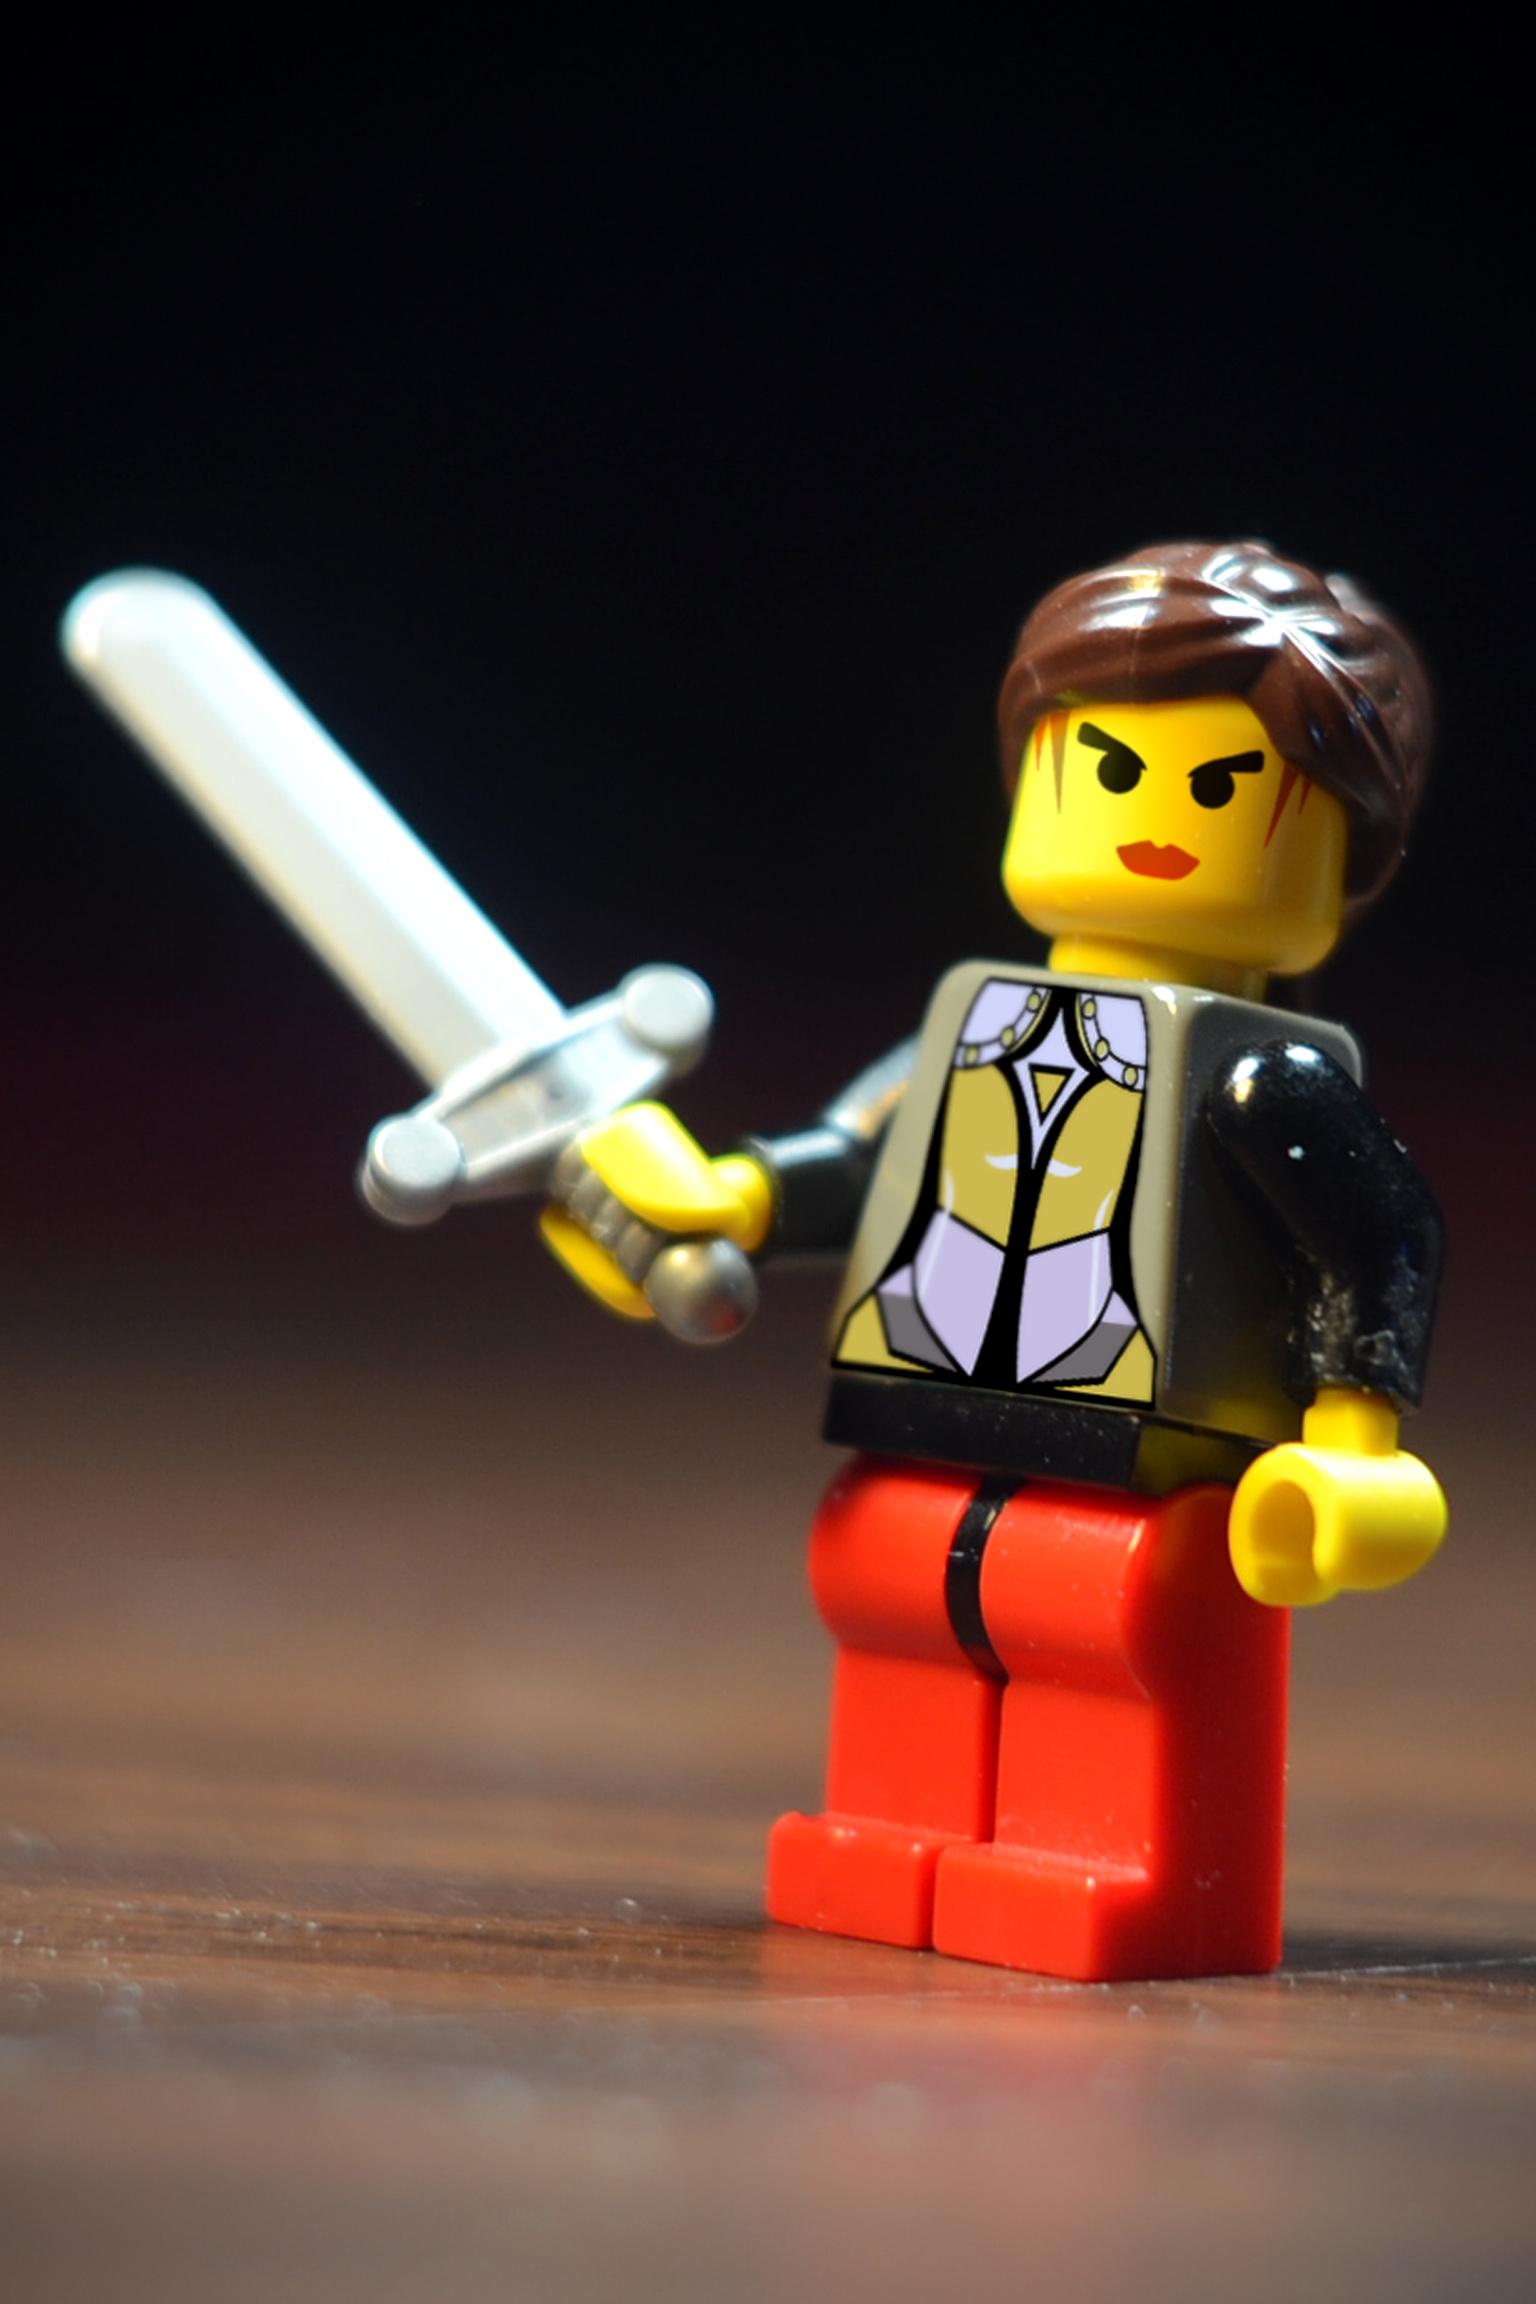 http://bricksafe.com/files/rioforce/Minifigures/Princess%20Storm/Knight%20Storm%20Composite2.jpg